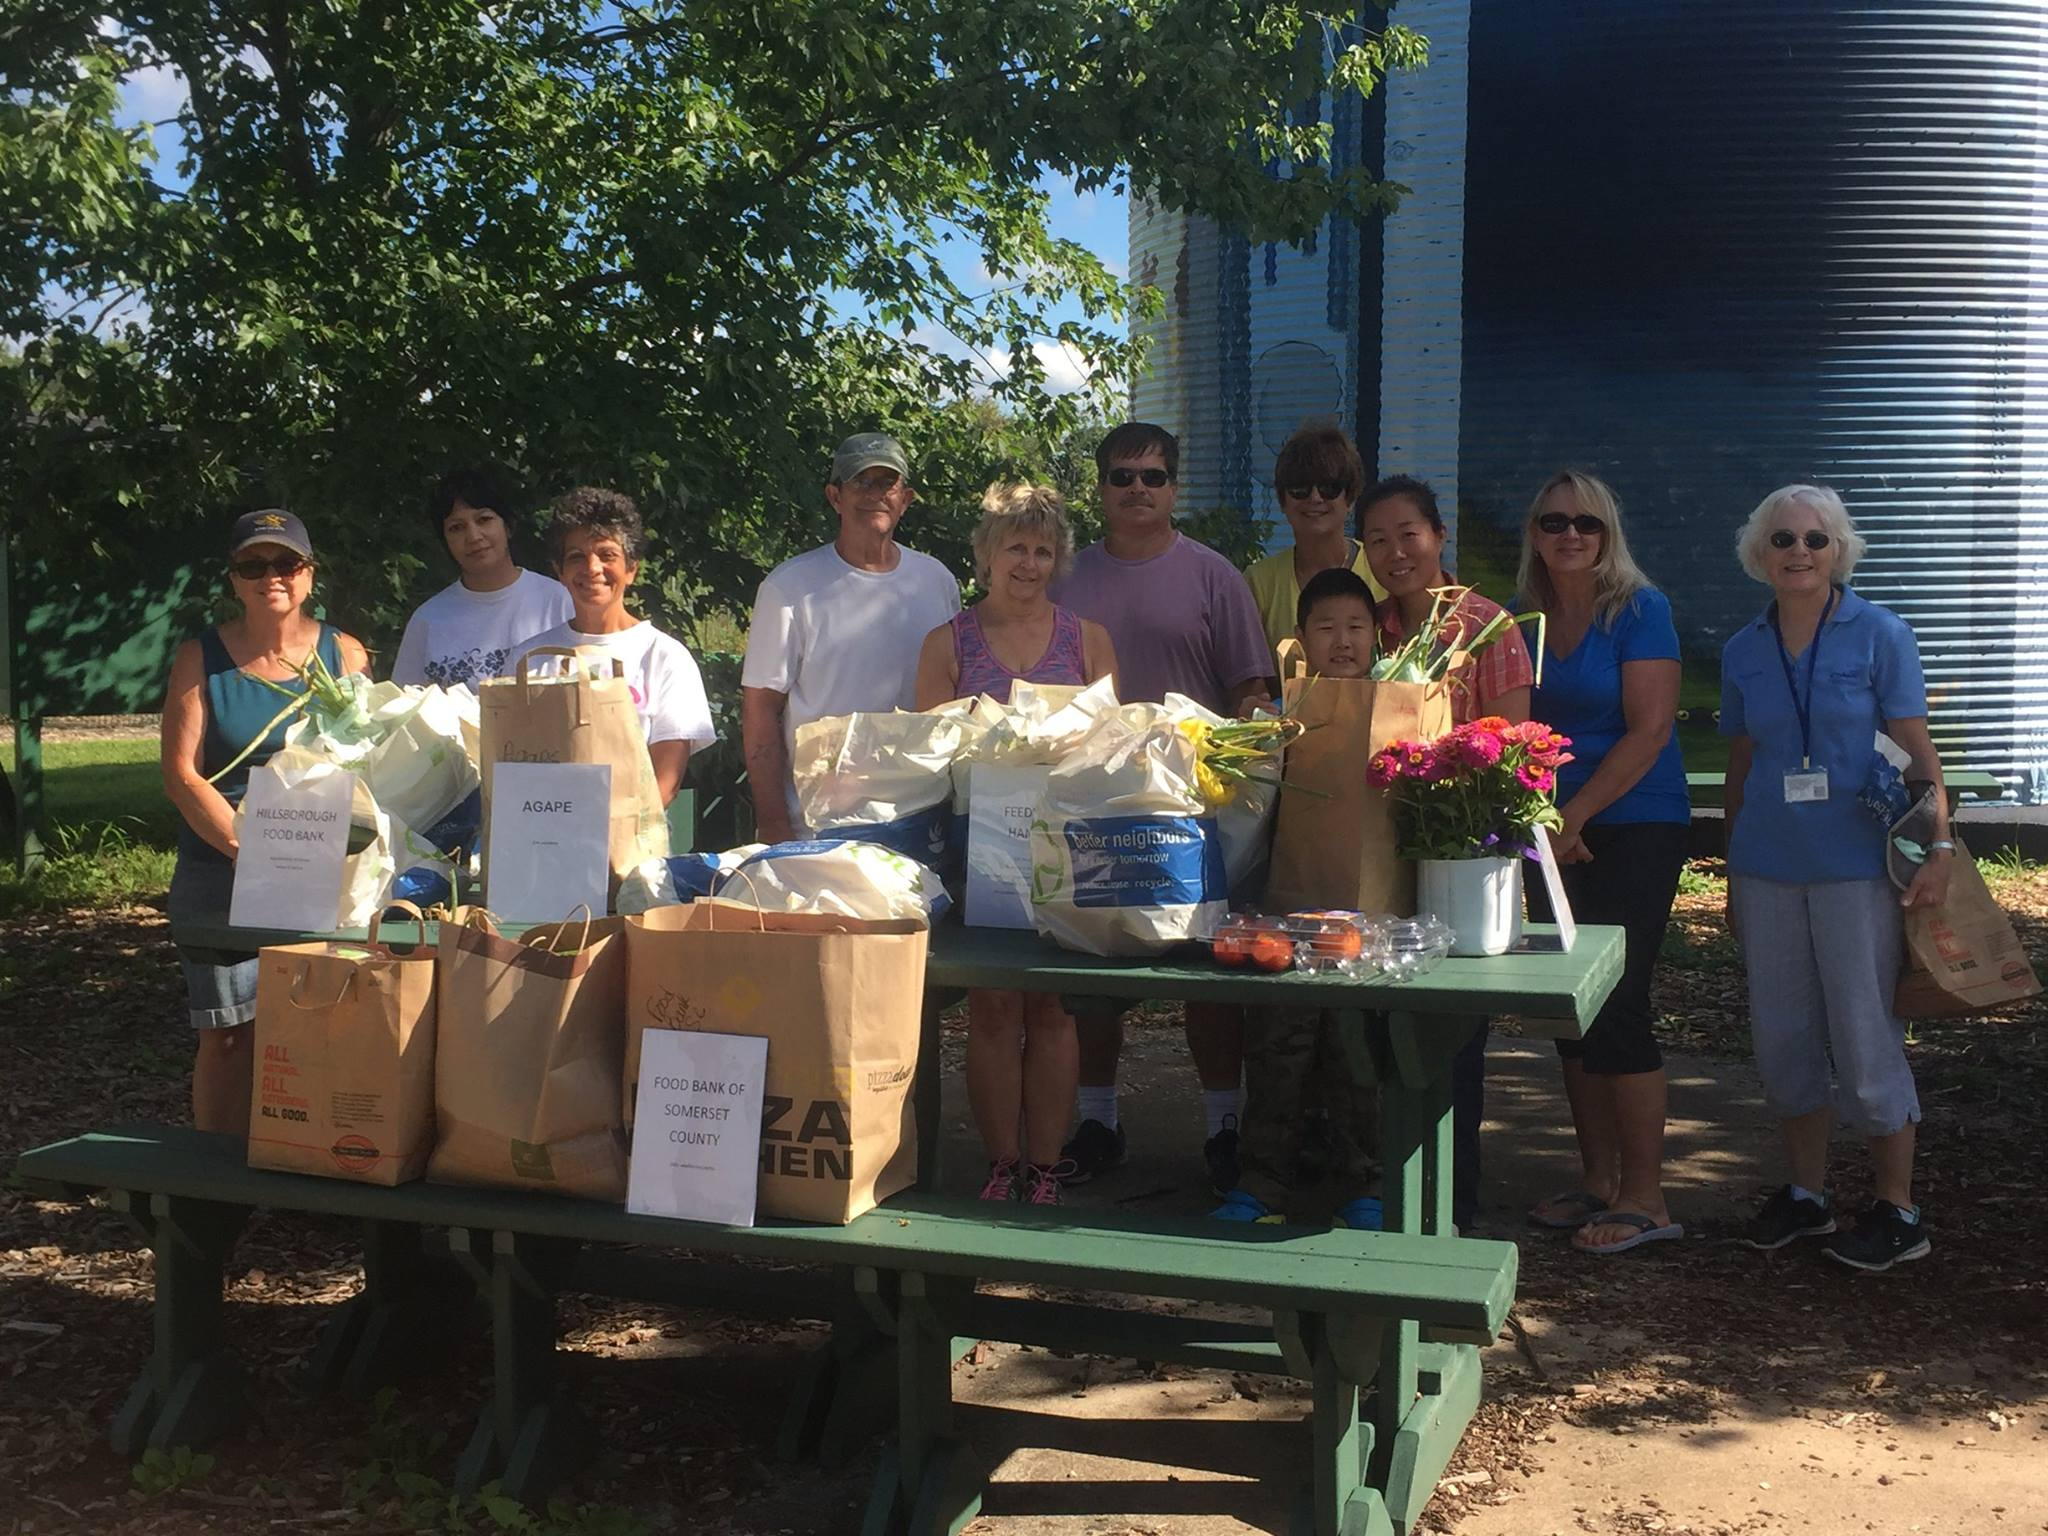 Fun Time clipart community garden Banks More of 000lbs Duke